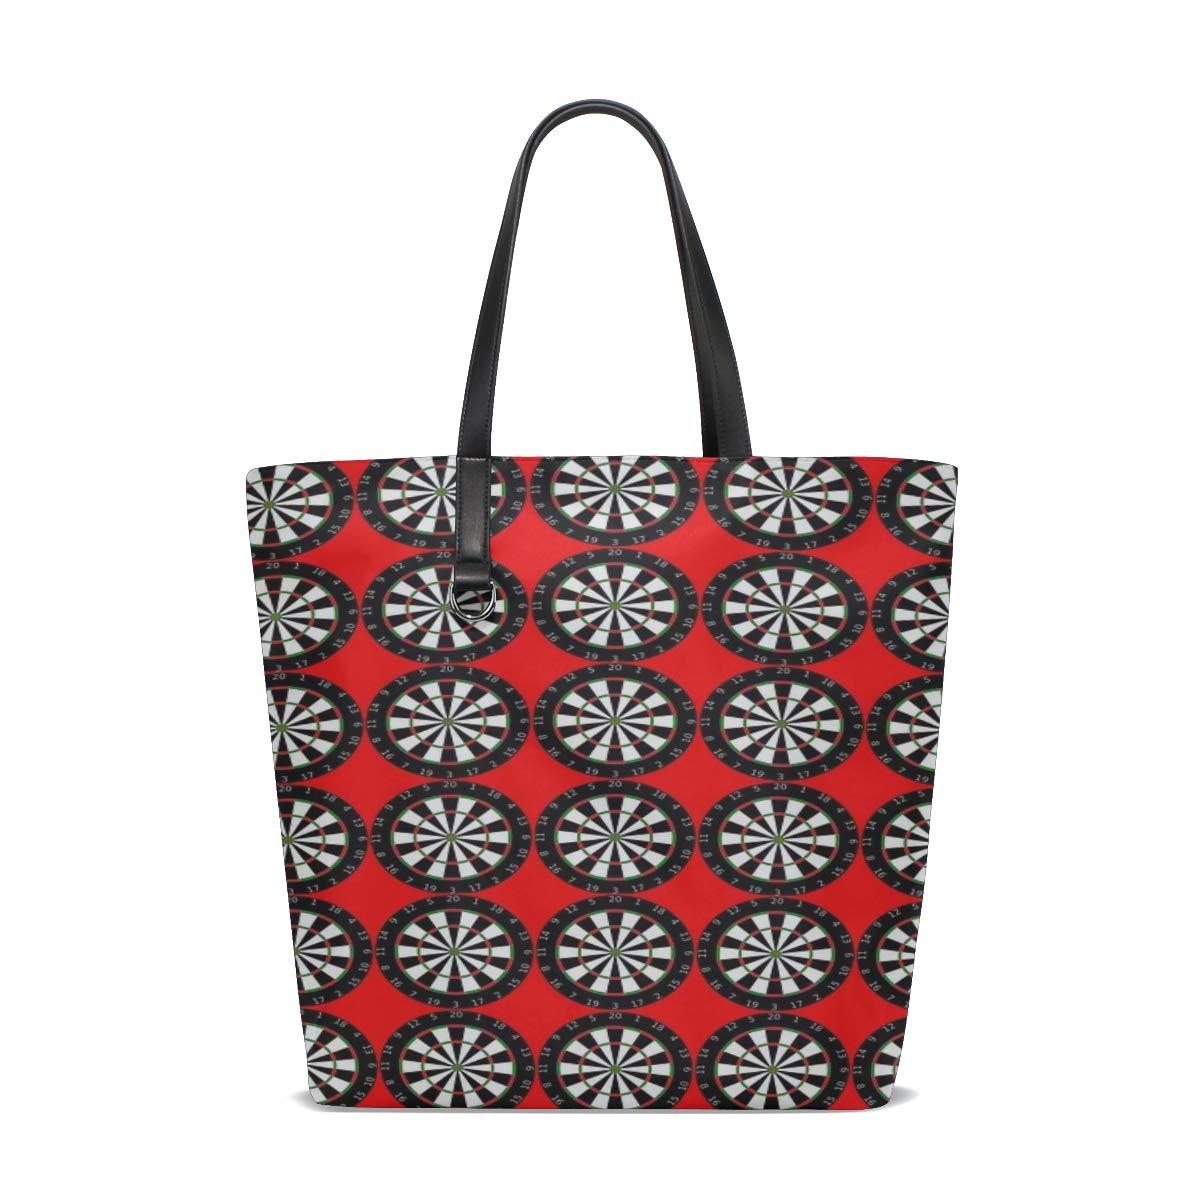 16345a515e27 Amazon.com  Women Darts Dart Board Board Target Game Center Handle Satchel  Handbags Shoulder Bag Tote Purse Messenger Bags  Shoes